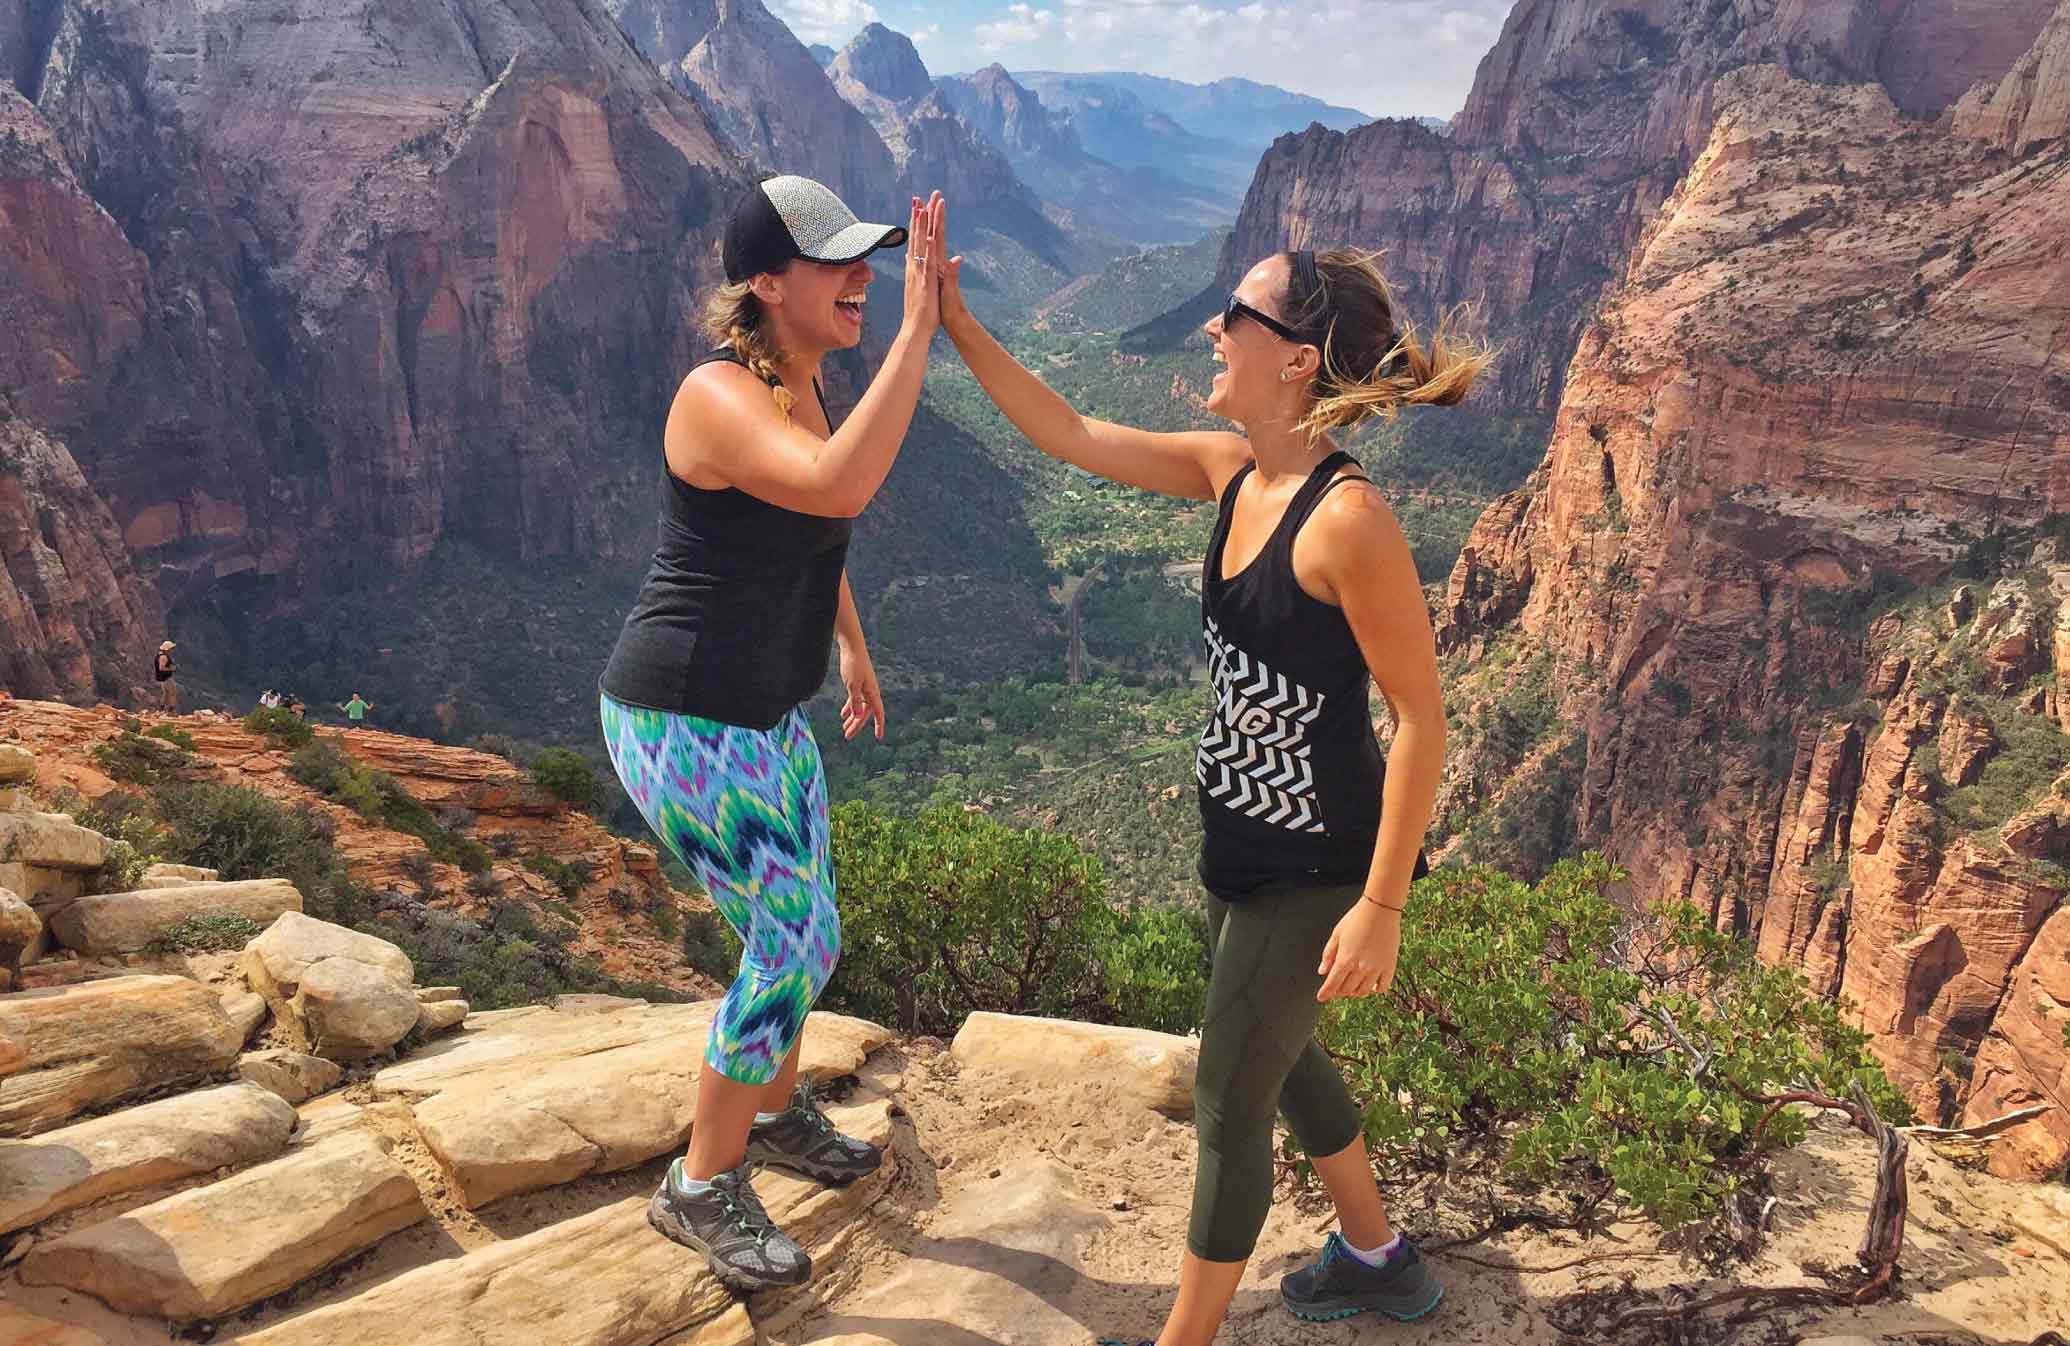 Woman Giving High Five on Hike